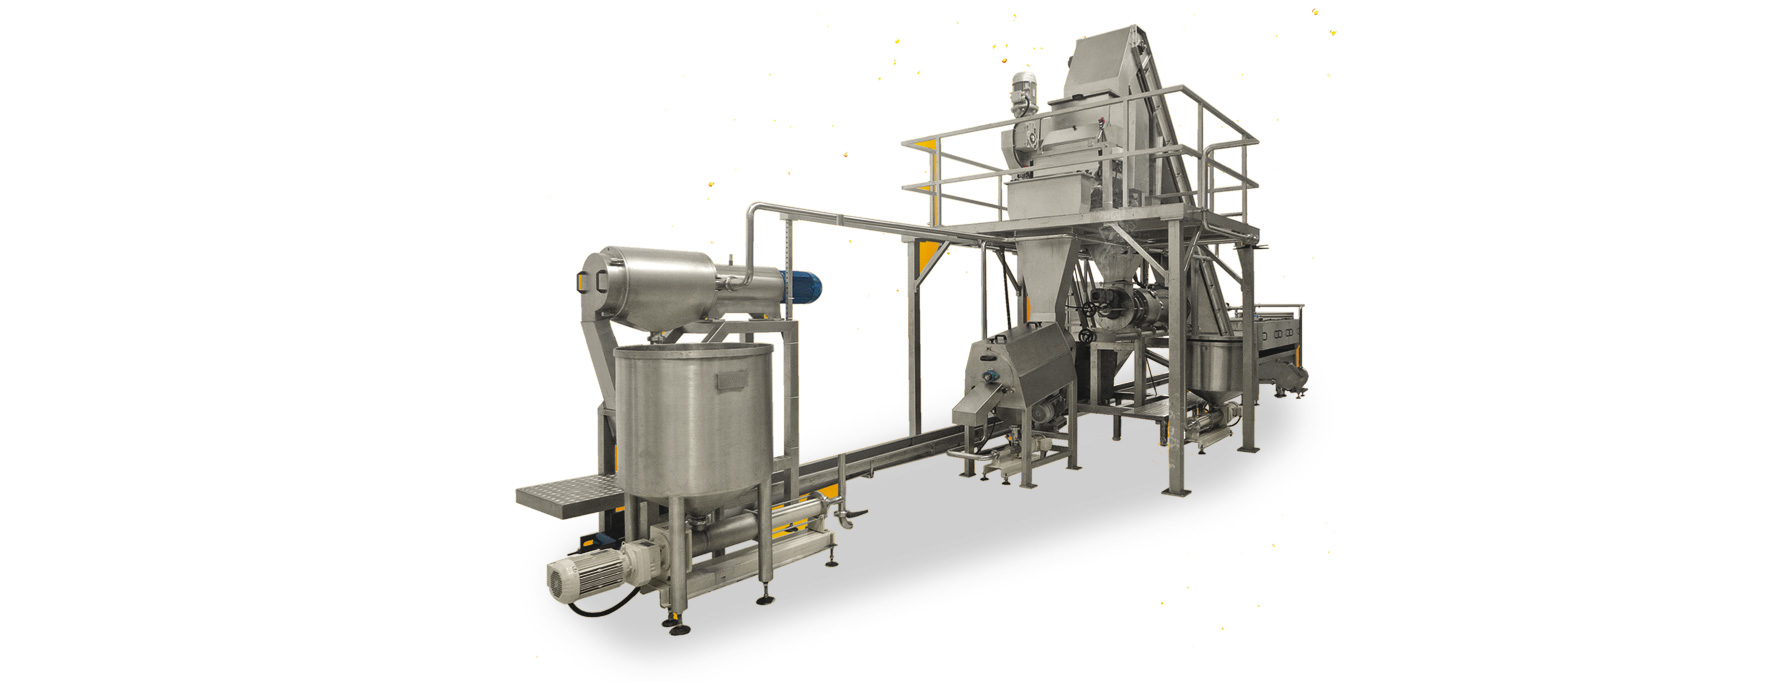 unite-extraction-Tropical-macchine-scontornate